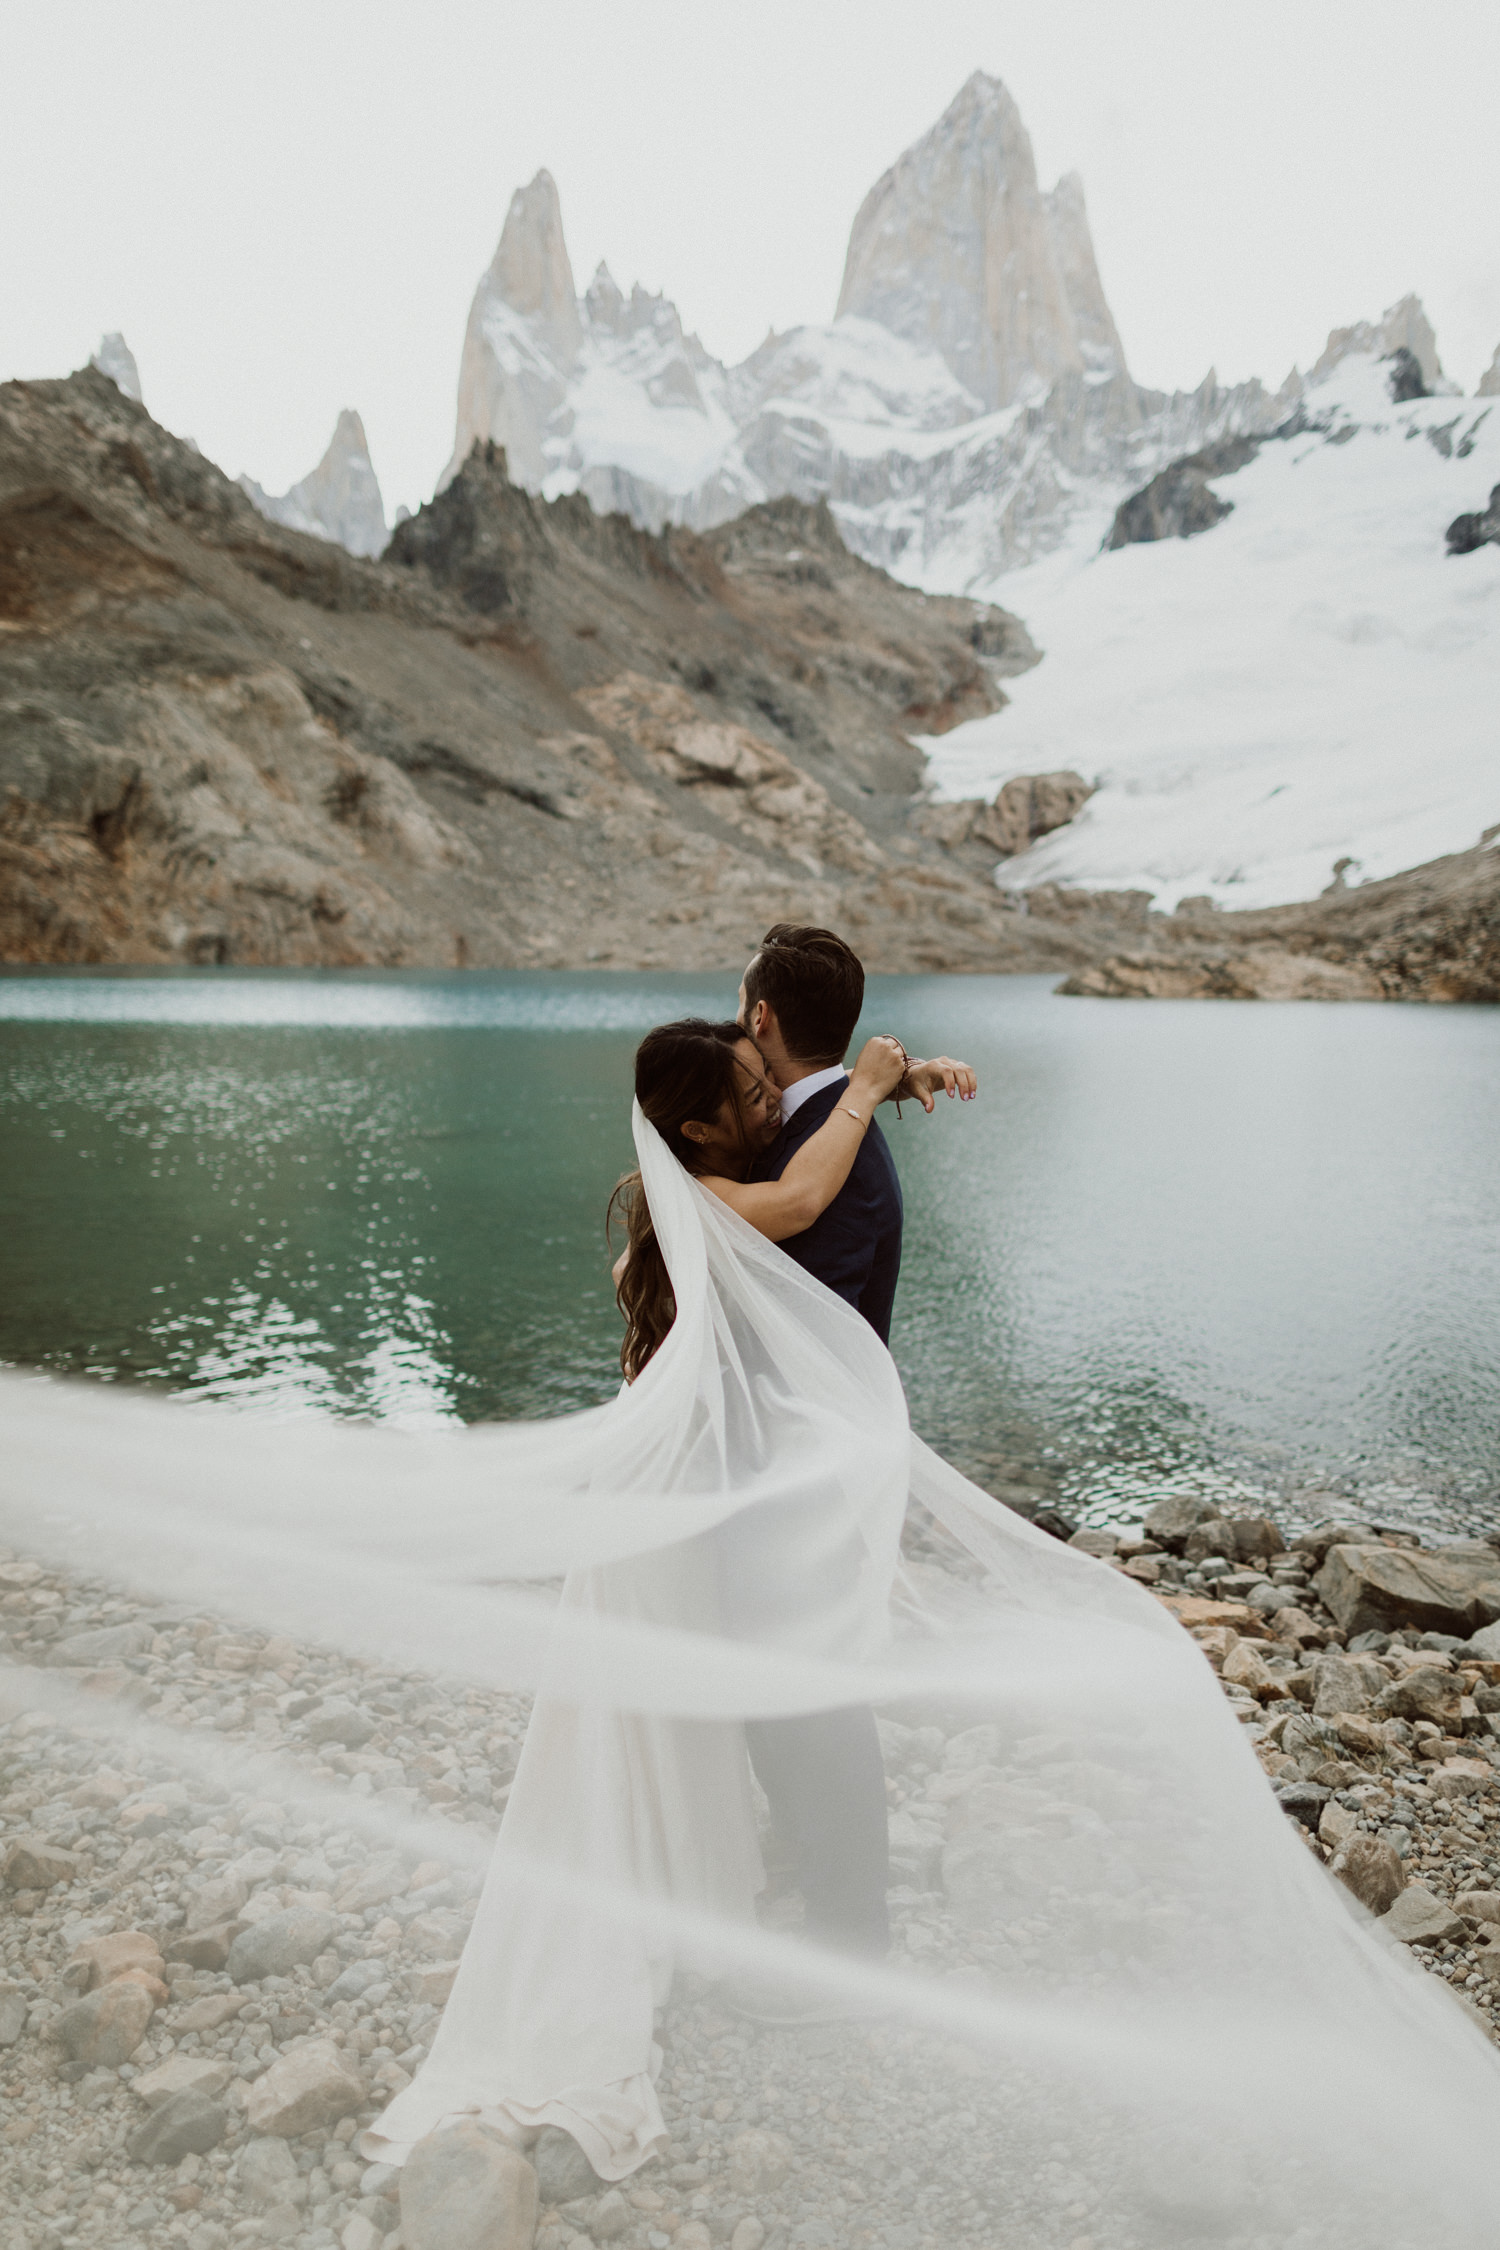 cedarandpines-kasey-erich-wedding-41.jpg